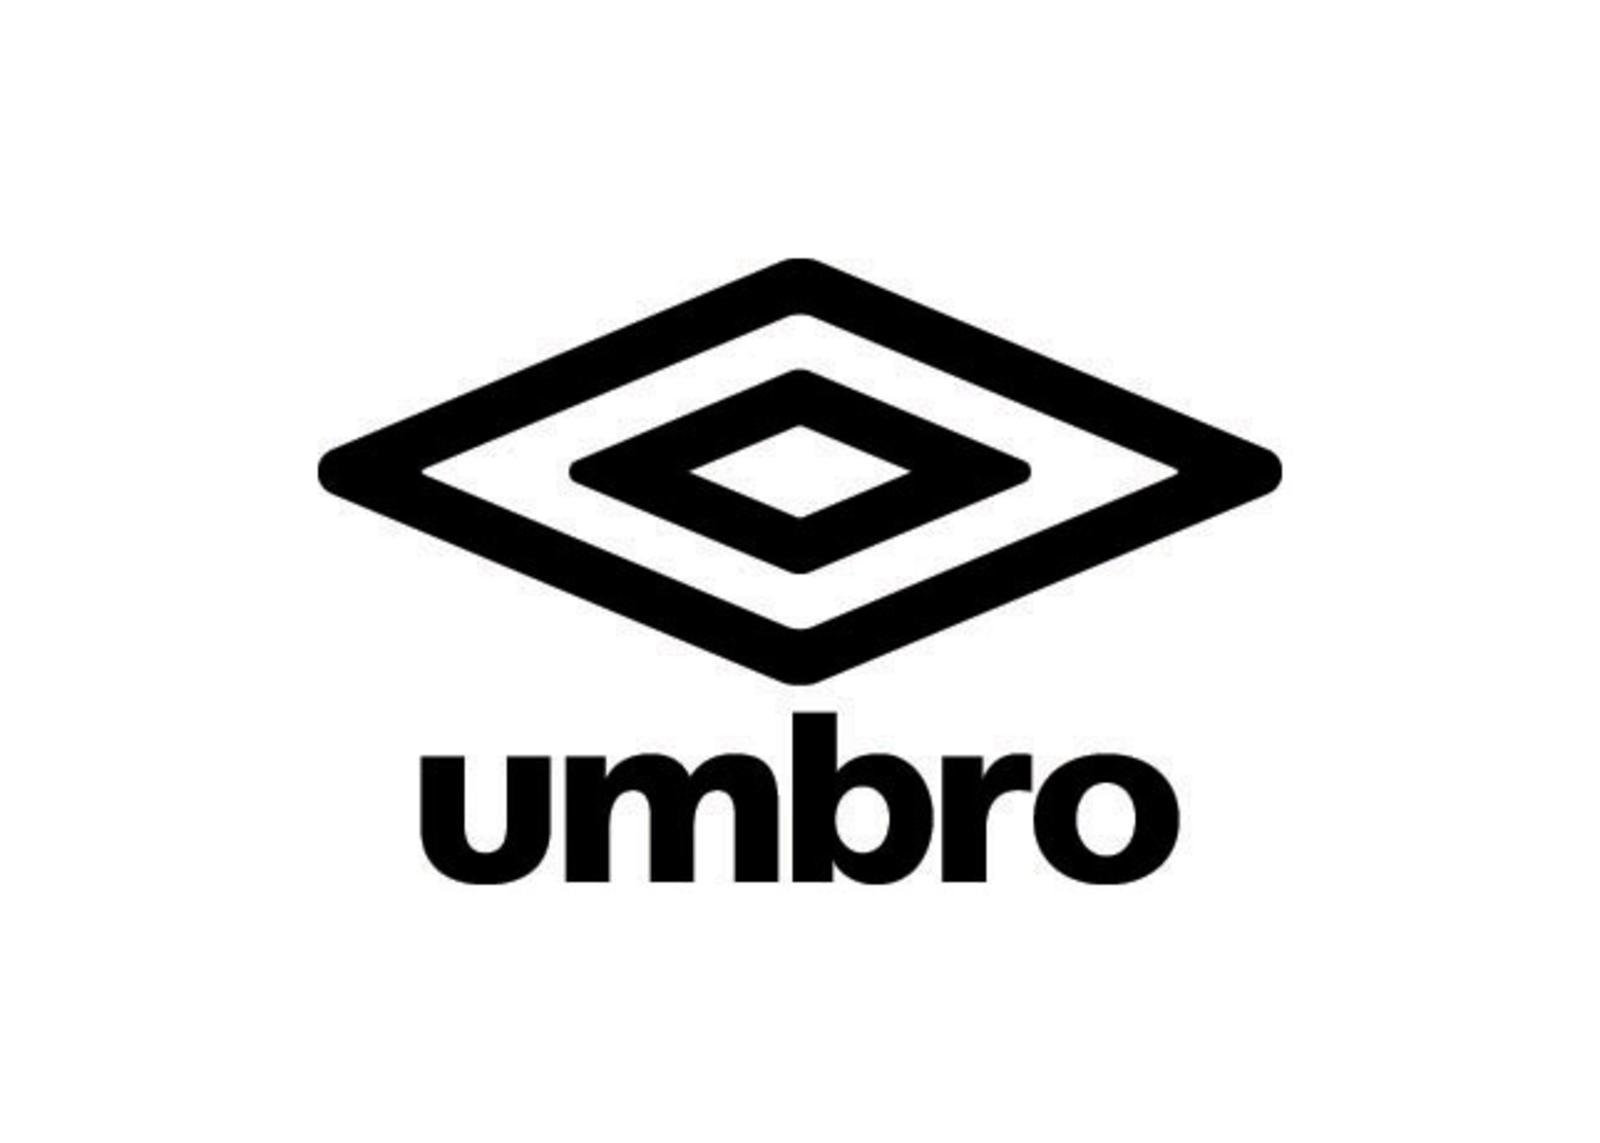 Umbro_Logo_type_native_1600.jpg